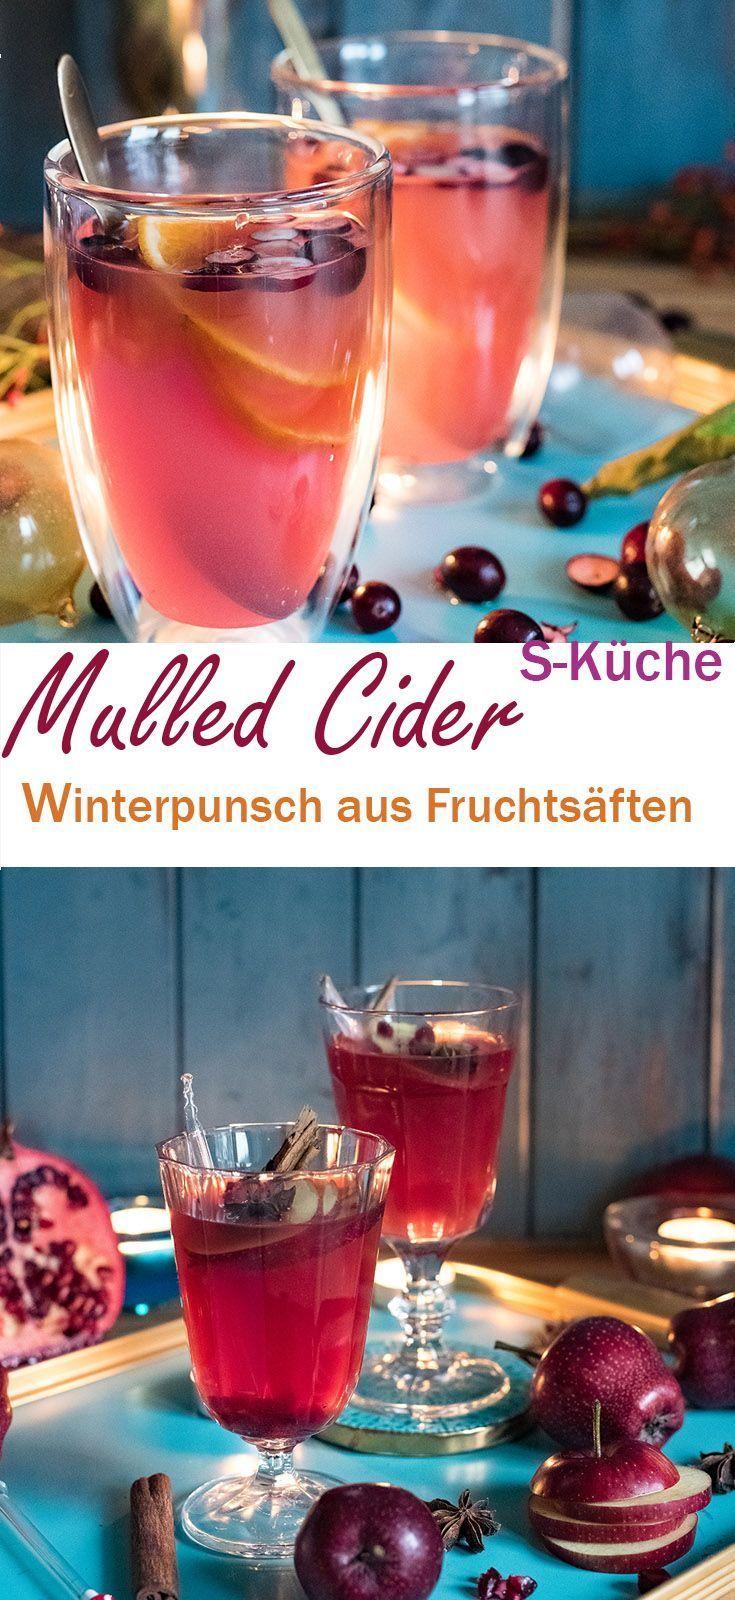 Blitzschneller Winterpunsch aus Fruchtsäften - Mulled Cider - s-Küche